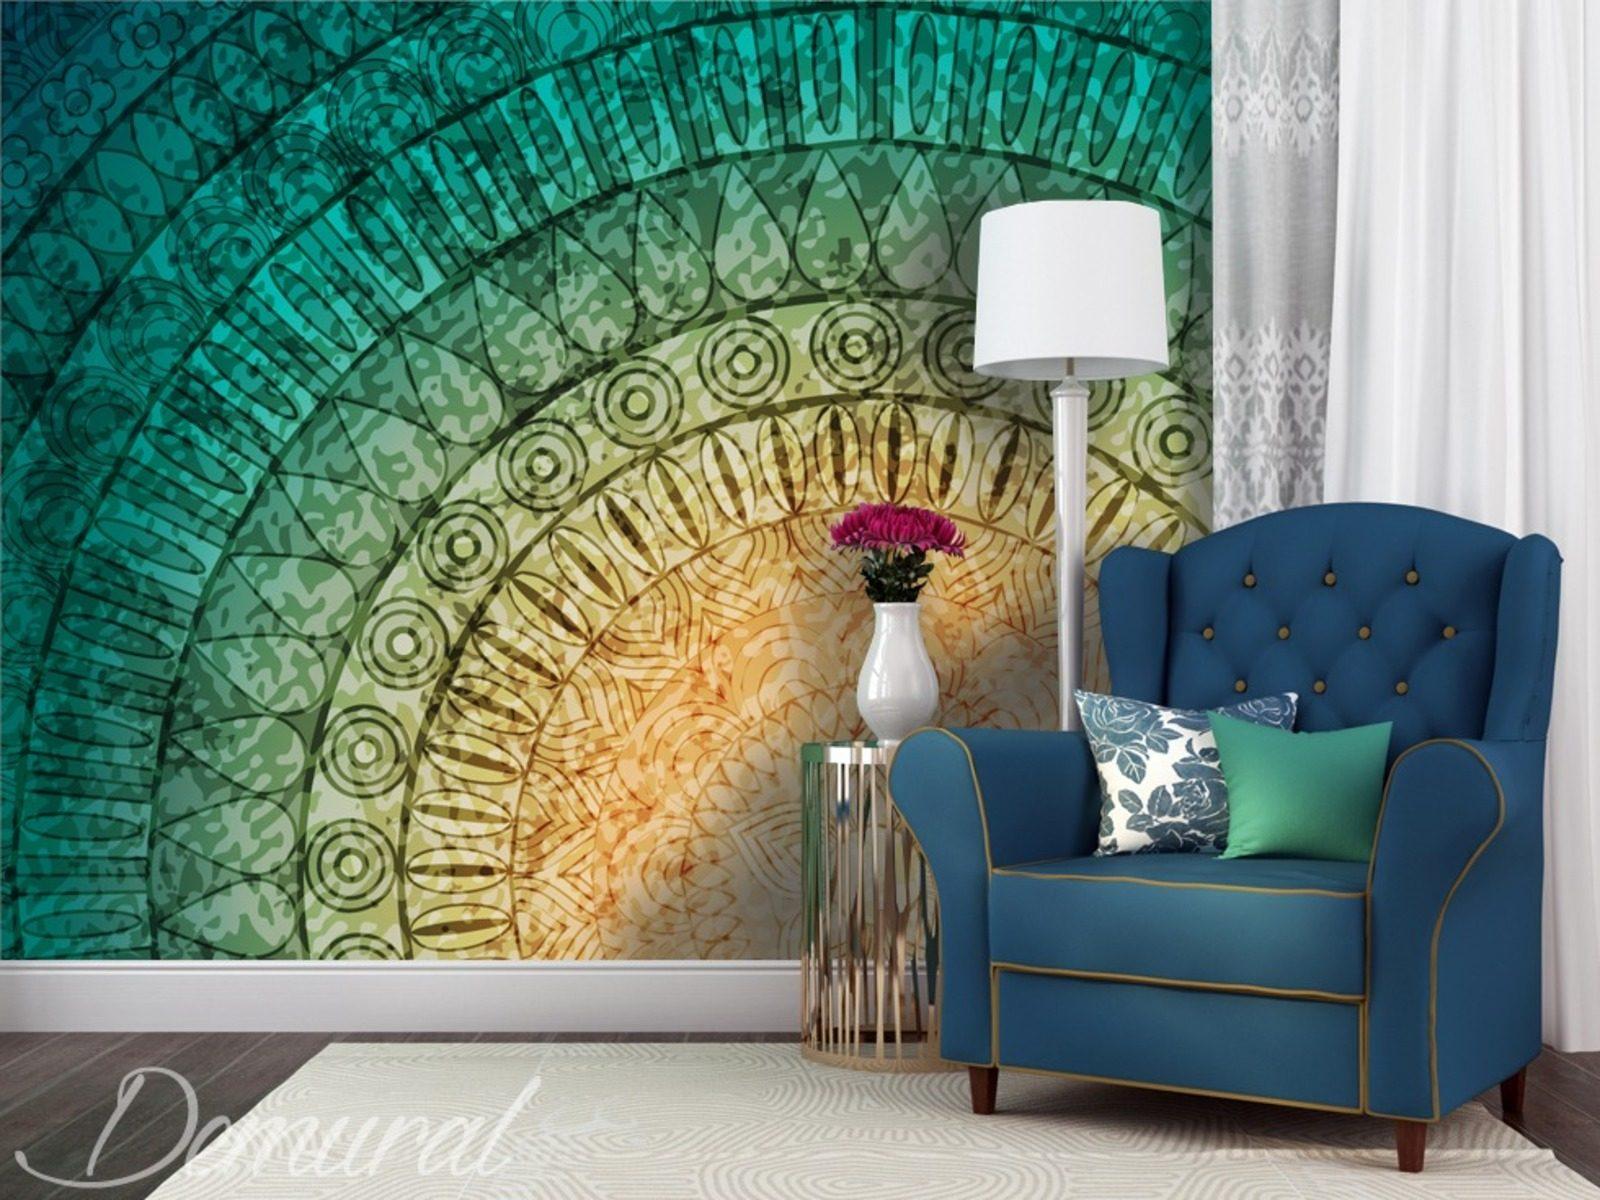 wand mandala fototapete f rs wohnzimmer fototapeten demural. Black Bedroom Furniture Sets. Home Design Ideas